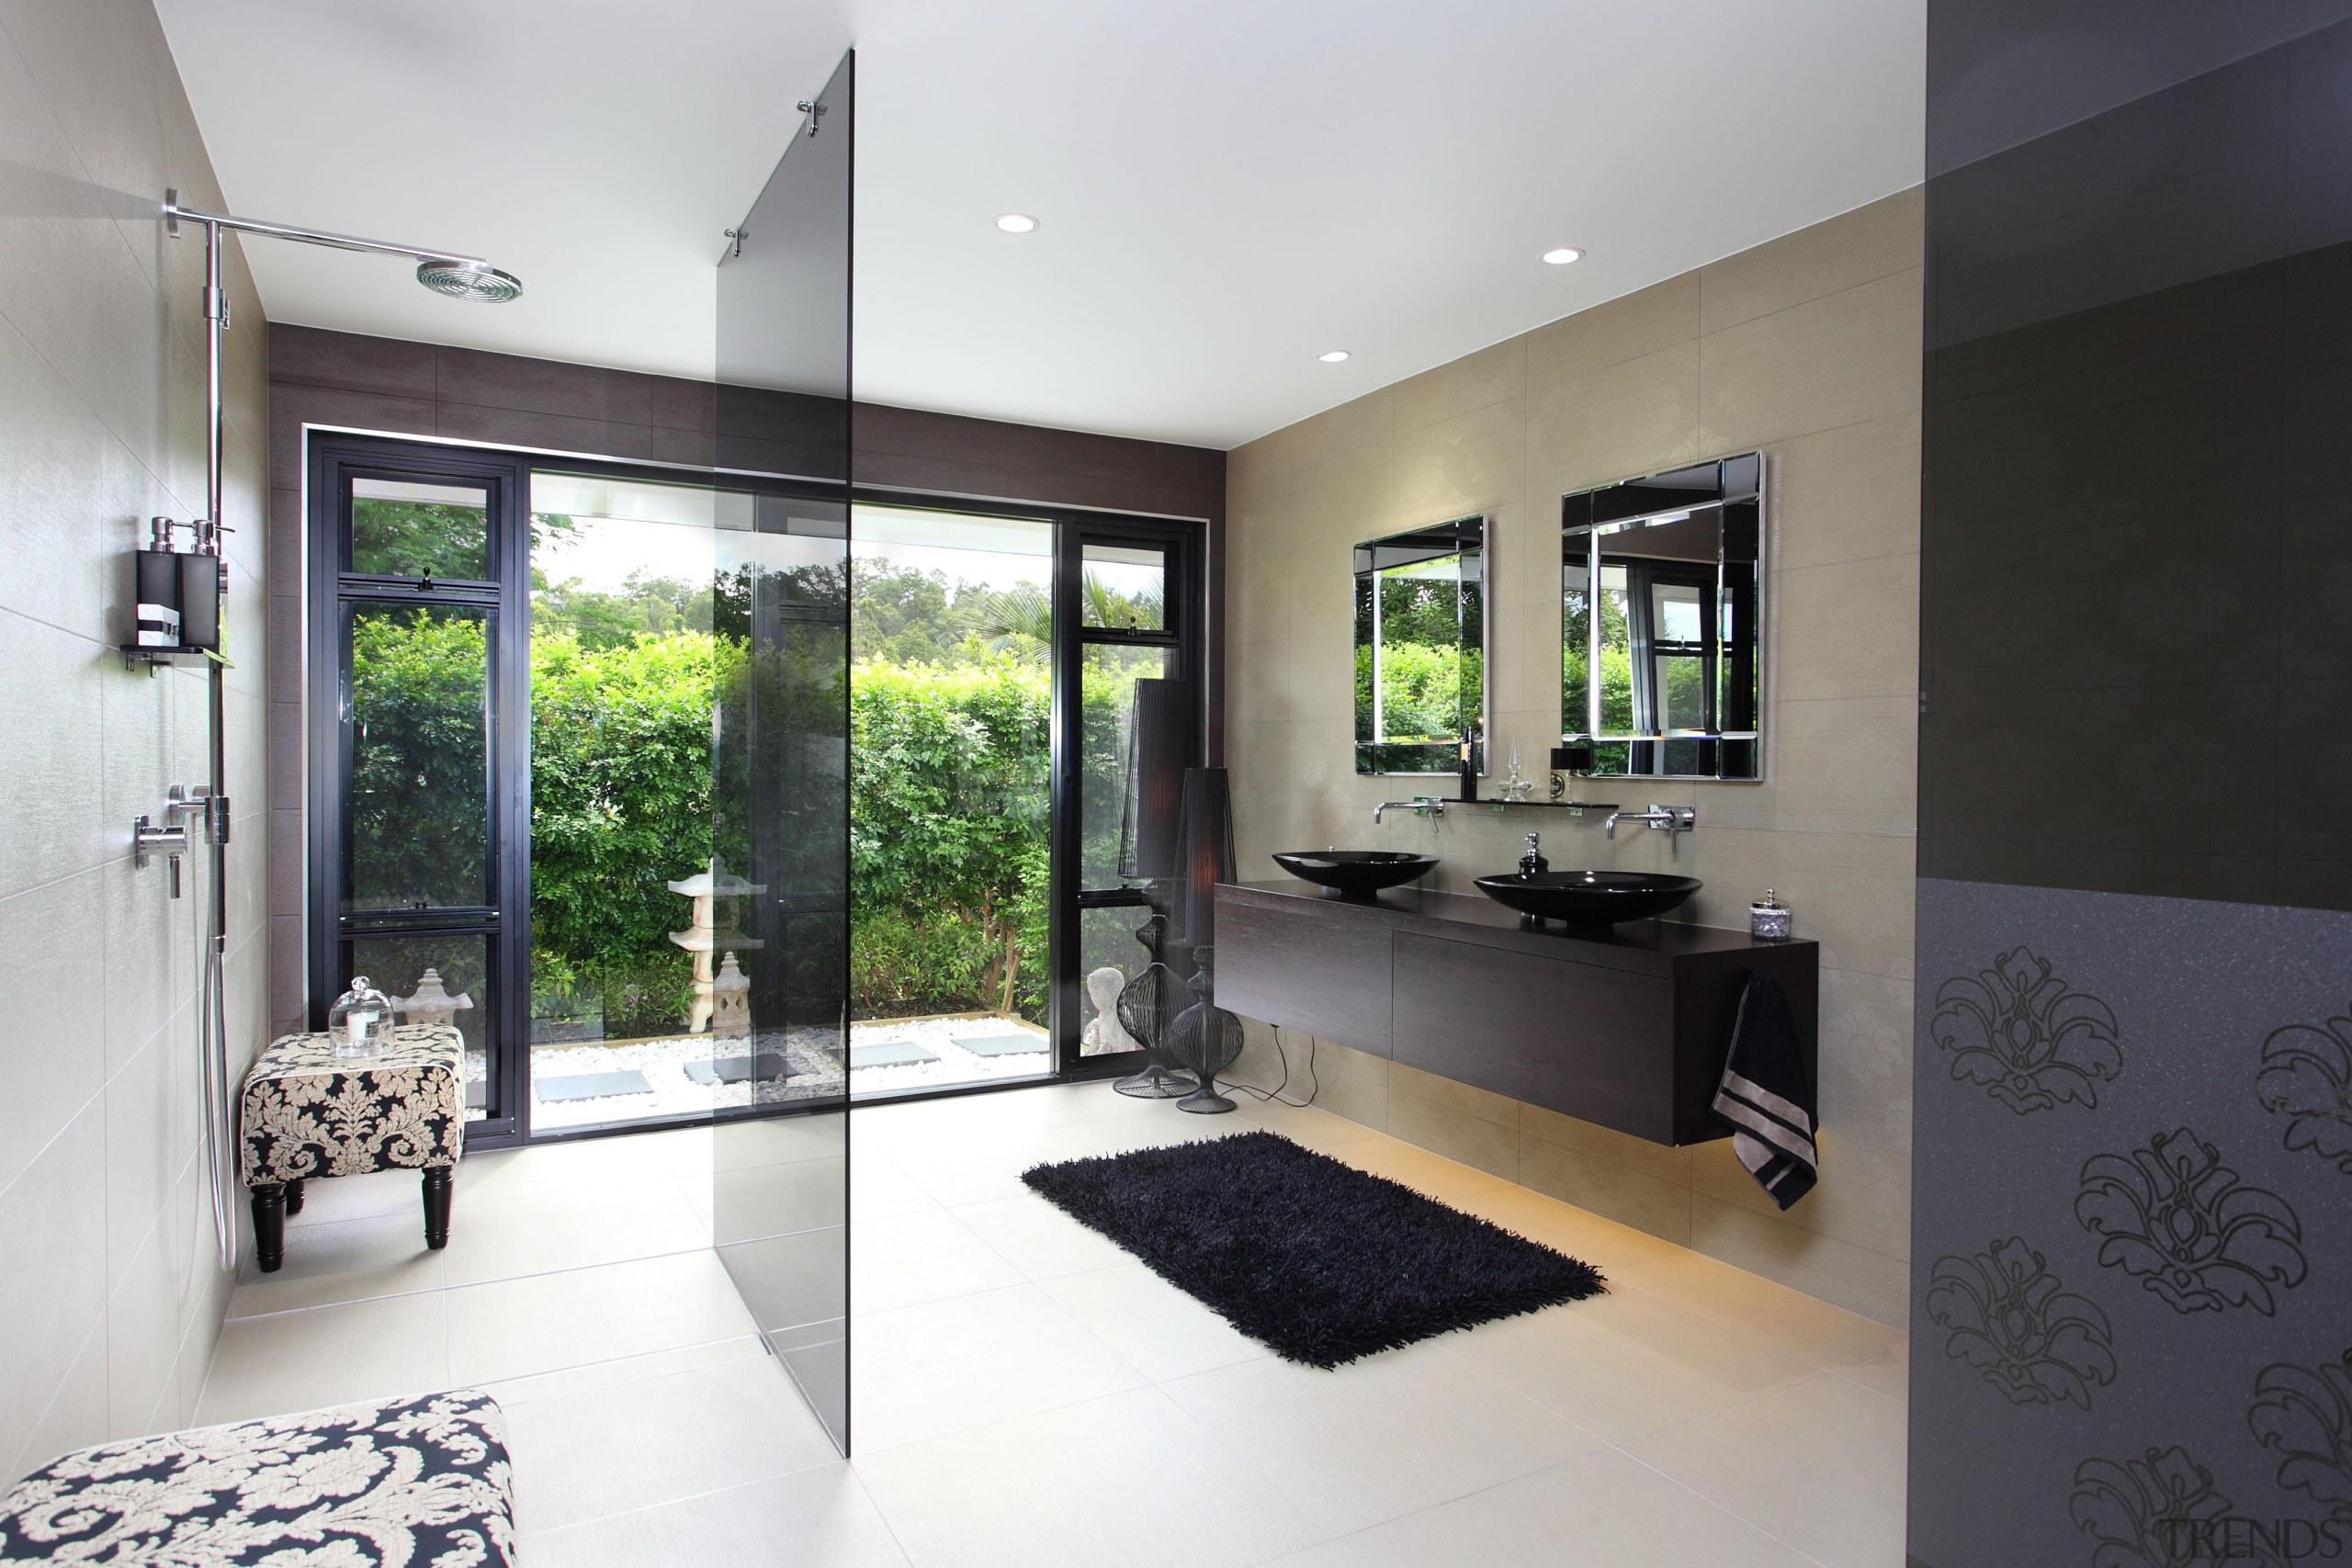 Winner Bathroom Design of the Year Queensland 2013 architecture, floor, home, house, interior design, living room, property, real estate, room, window, white, black